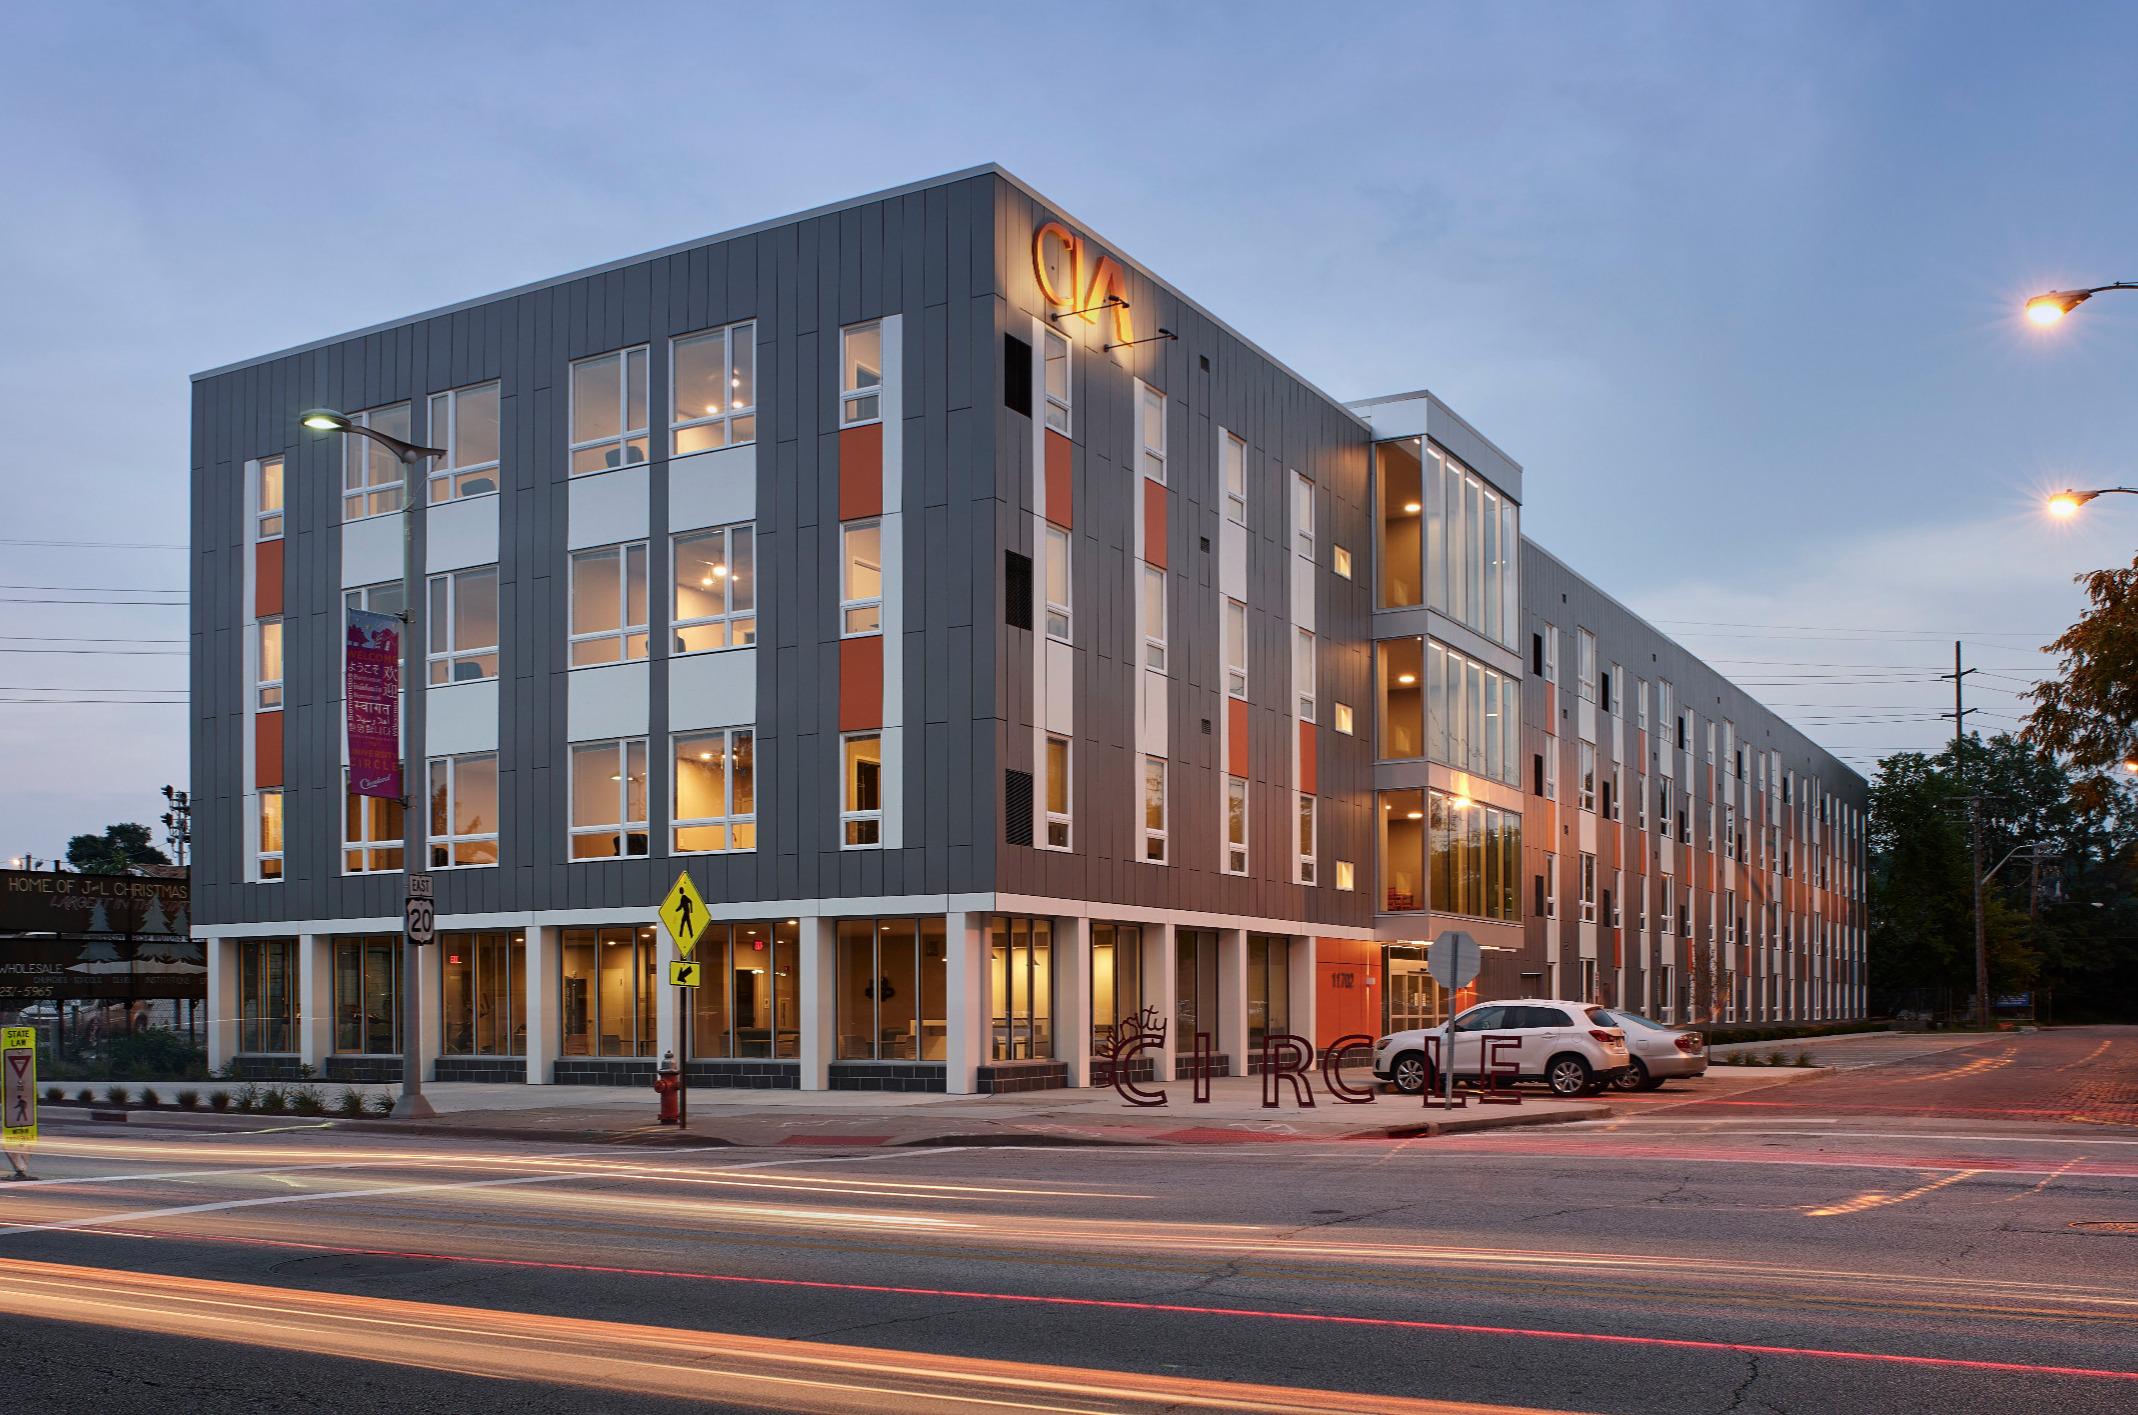 Clevaland Insttute of Art Housing